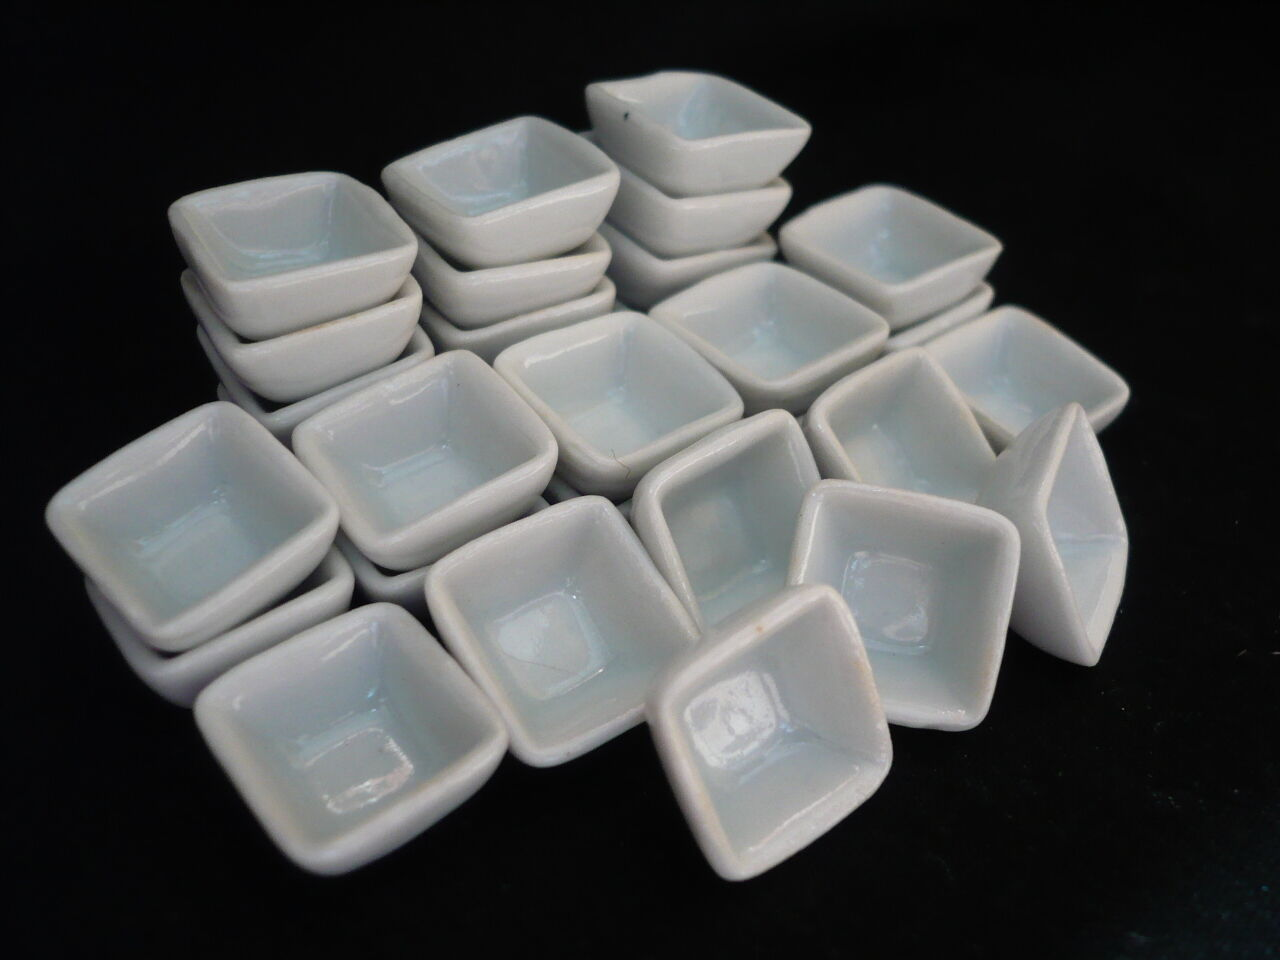 10x10 mm White Square Bowls Dollhouse Miniatures Ceramic Supply Deco